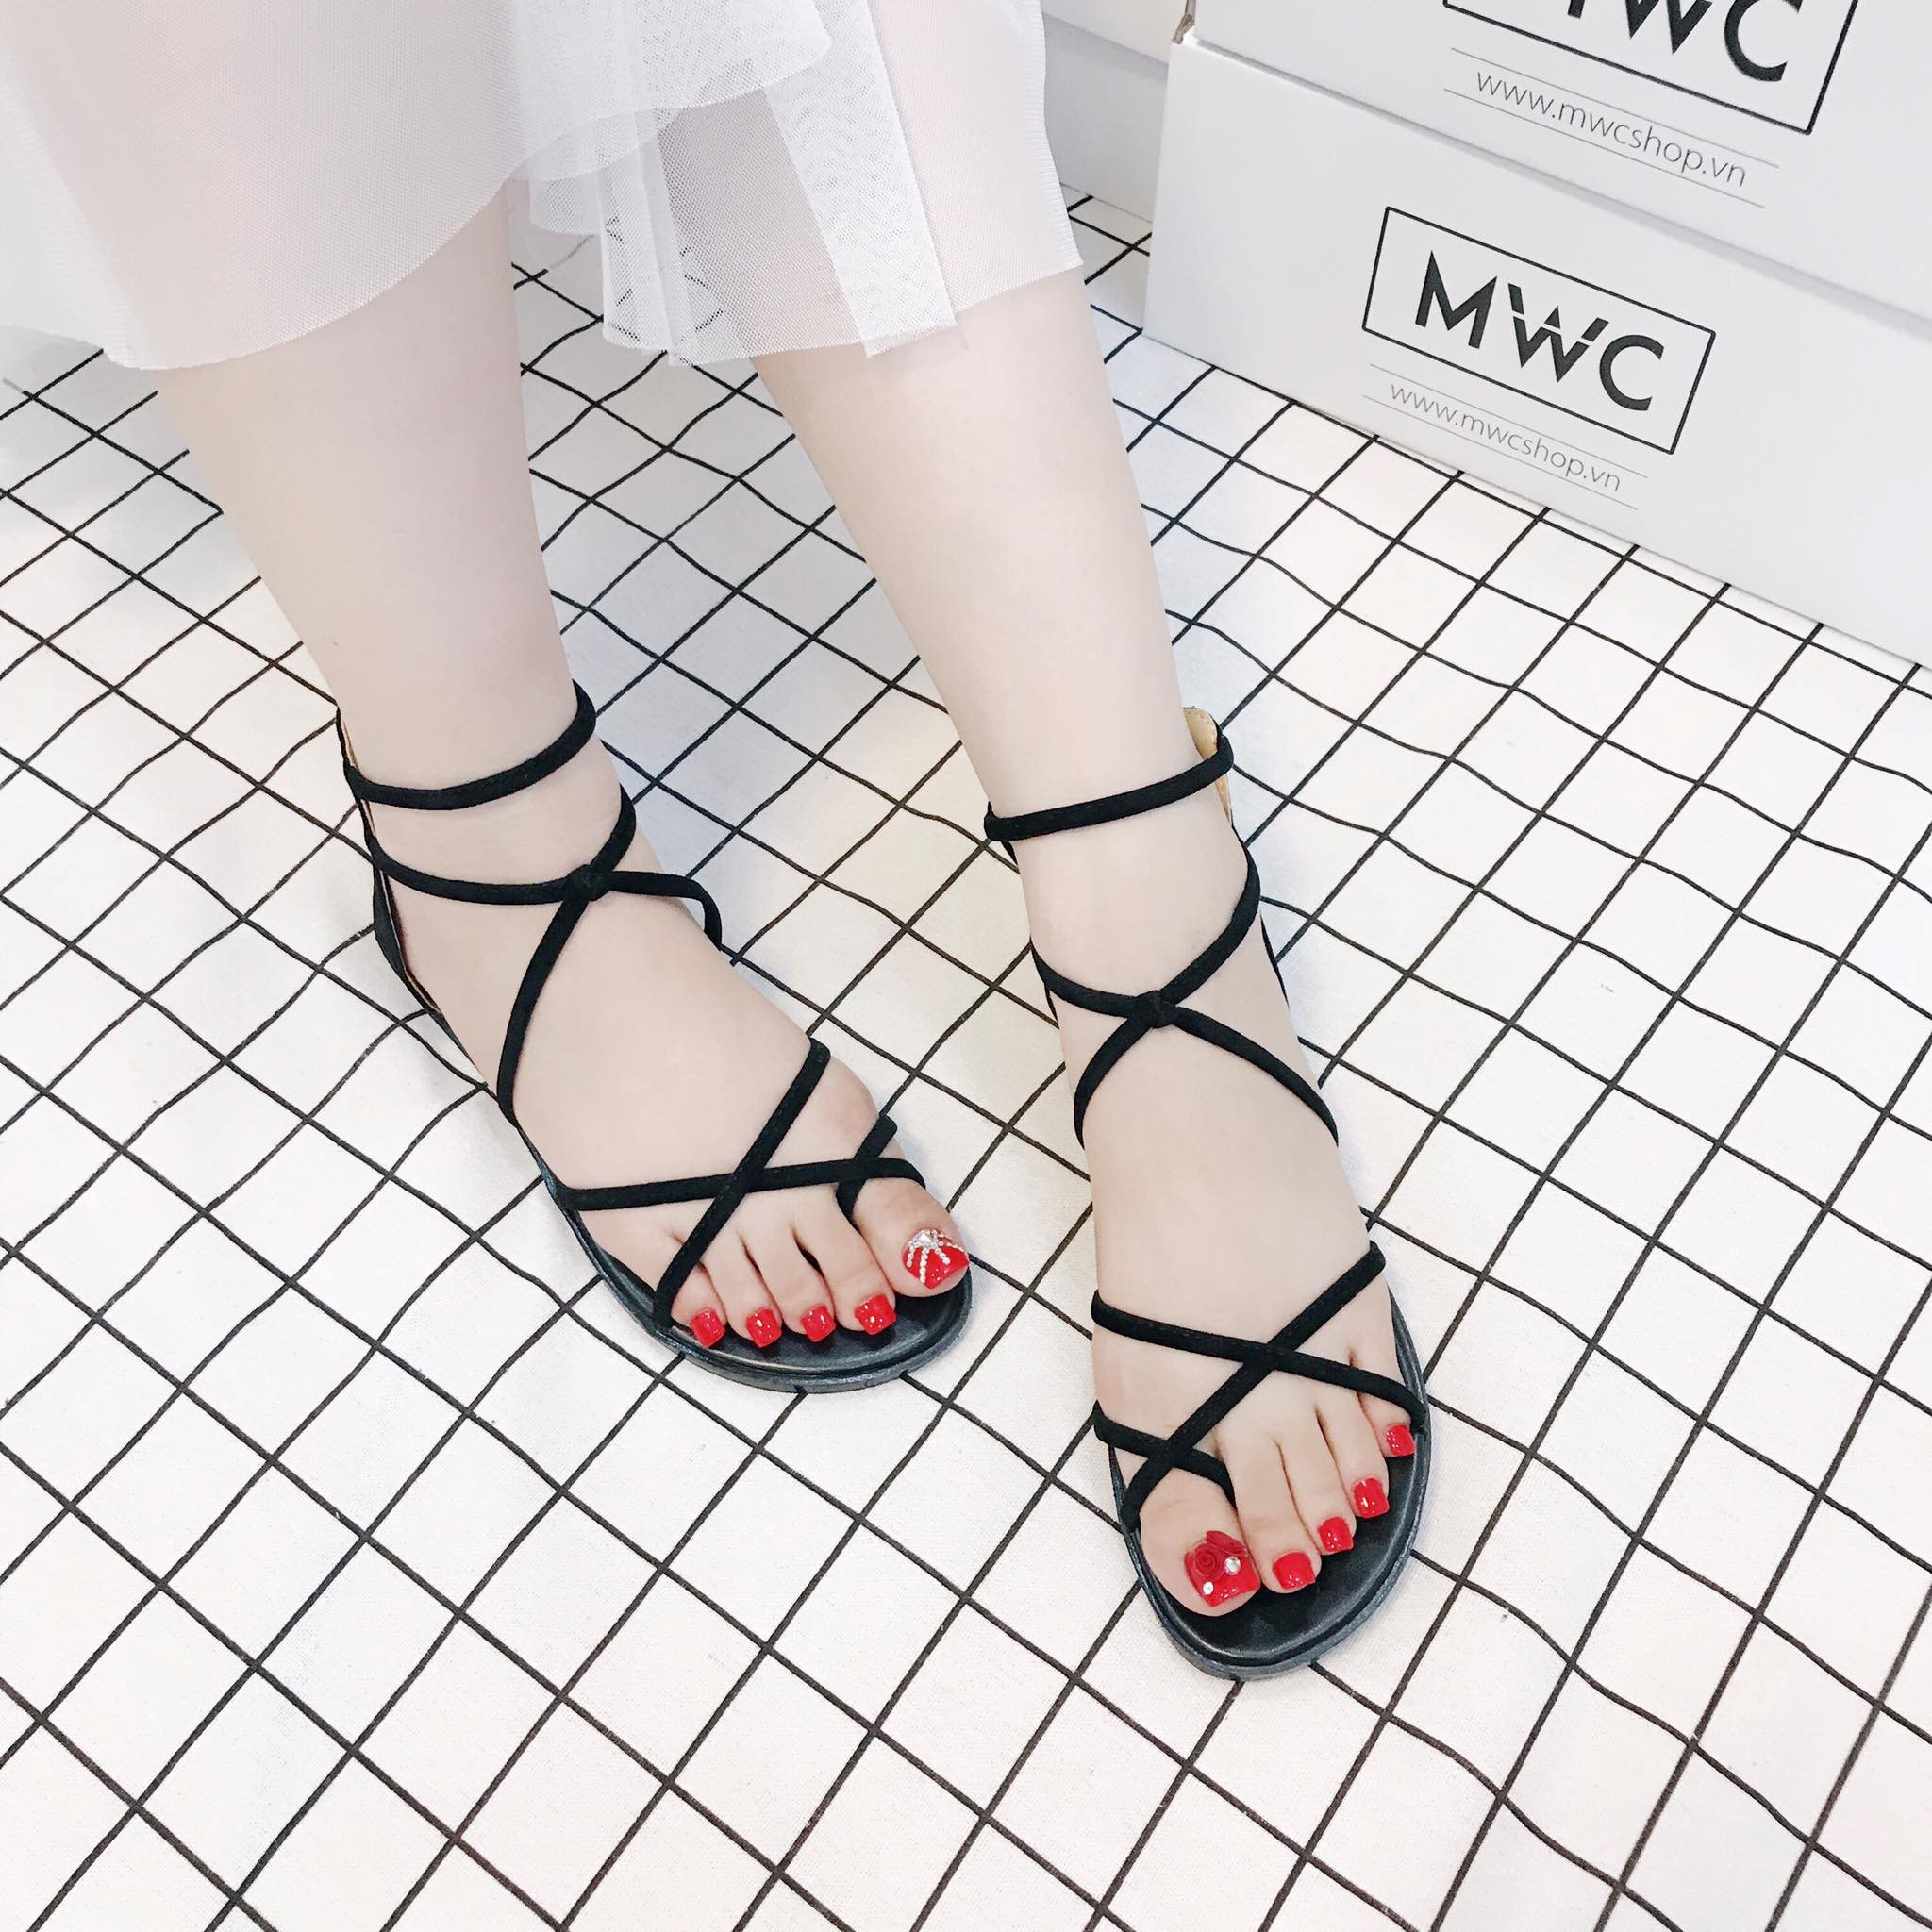 Giày sandal nữ MWC NUSD- 2524 - ĐEN